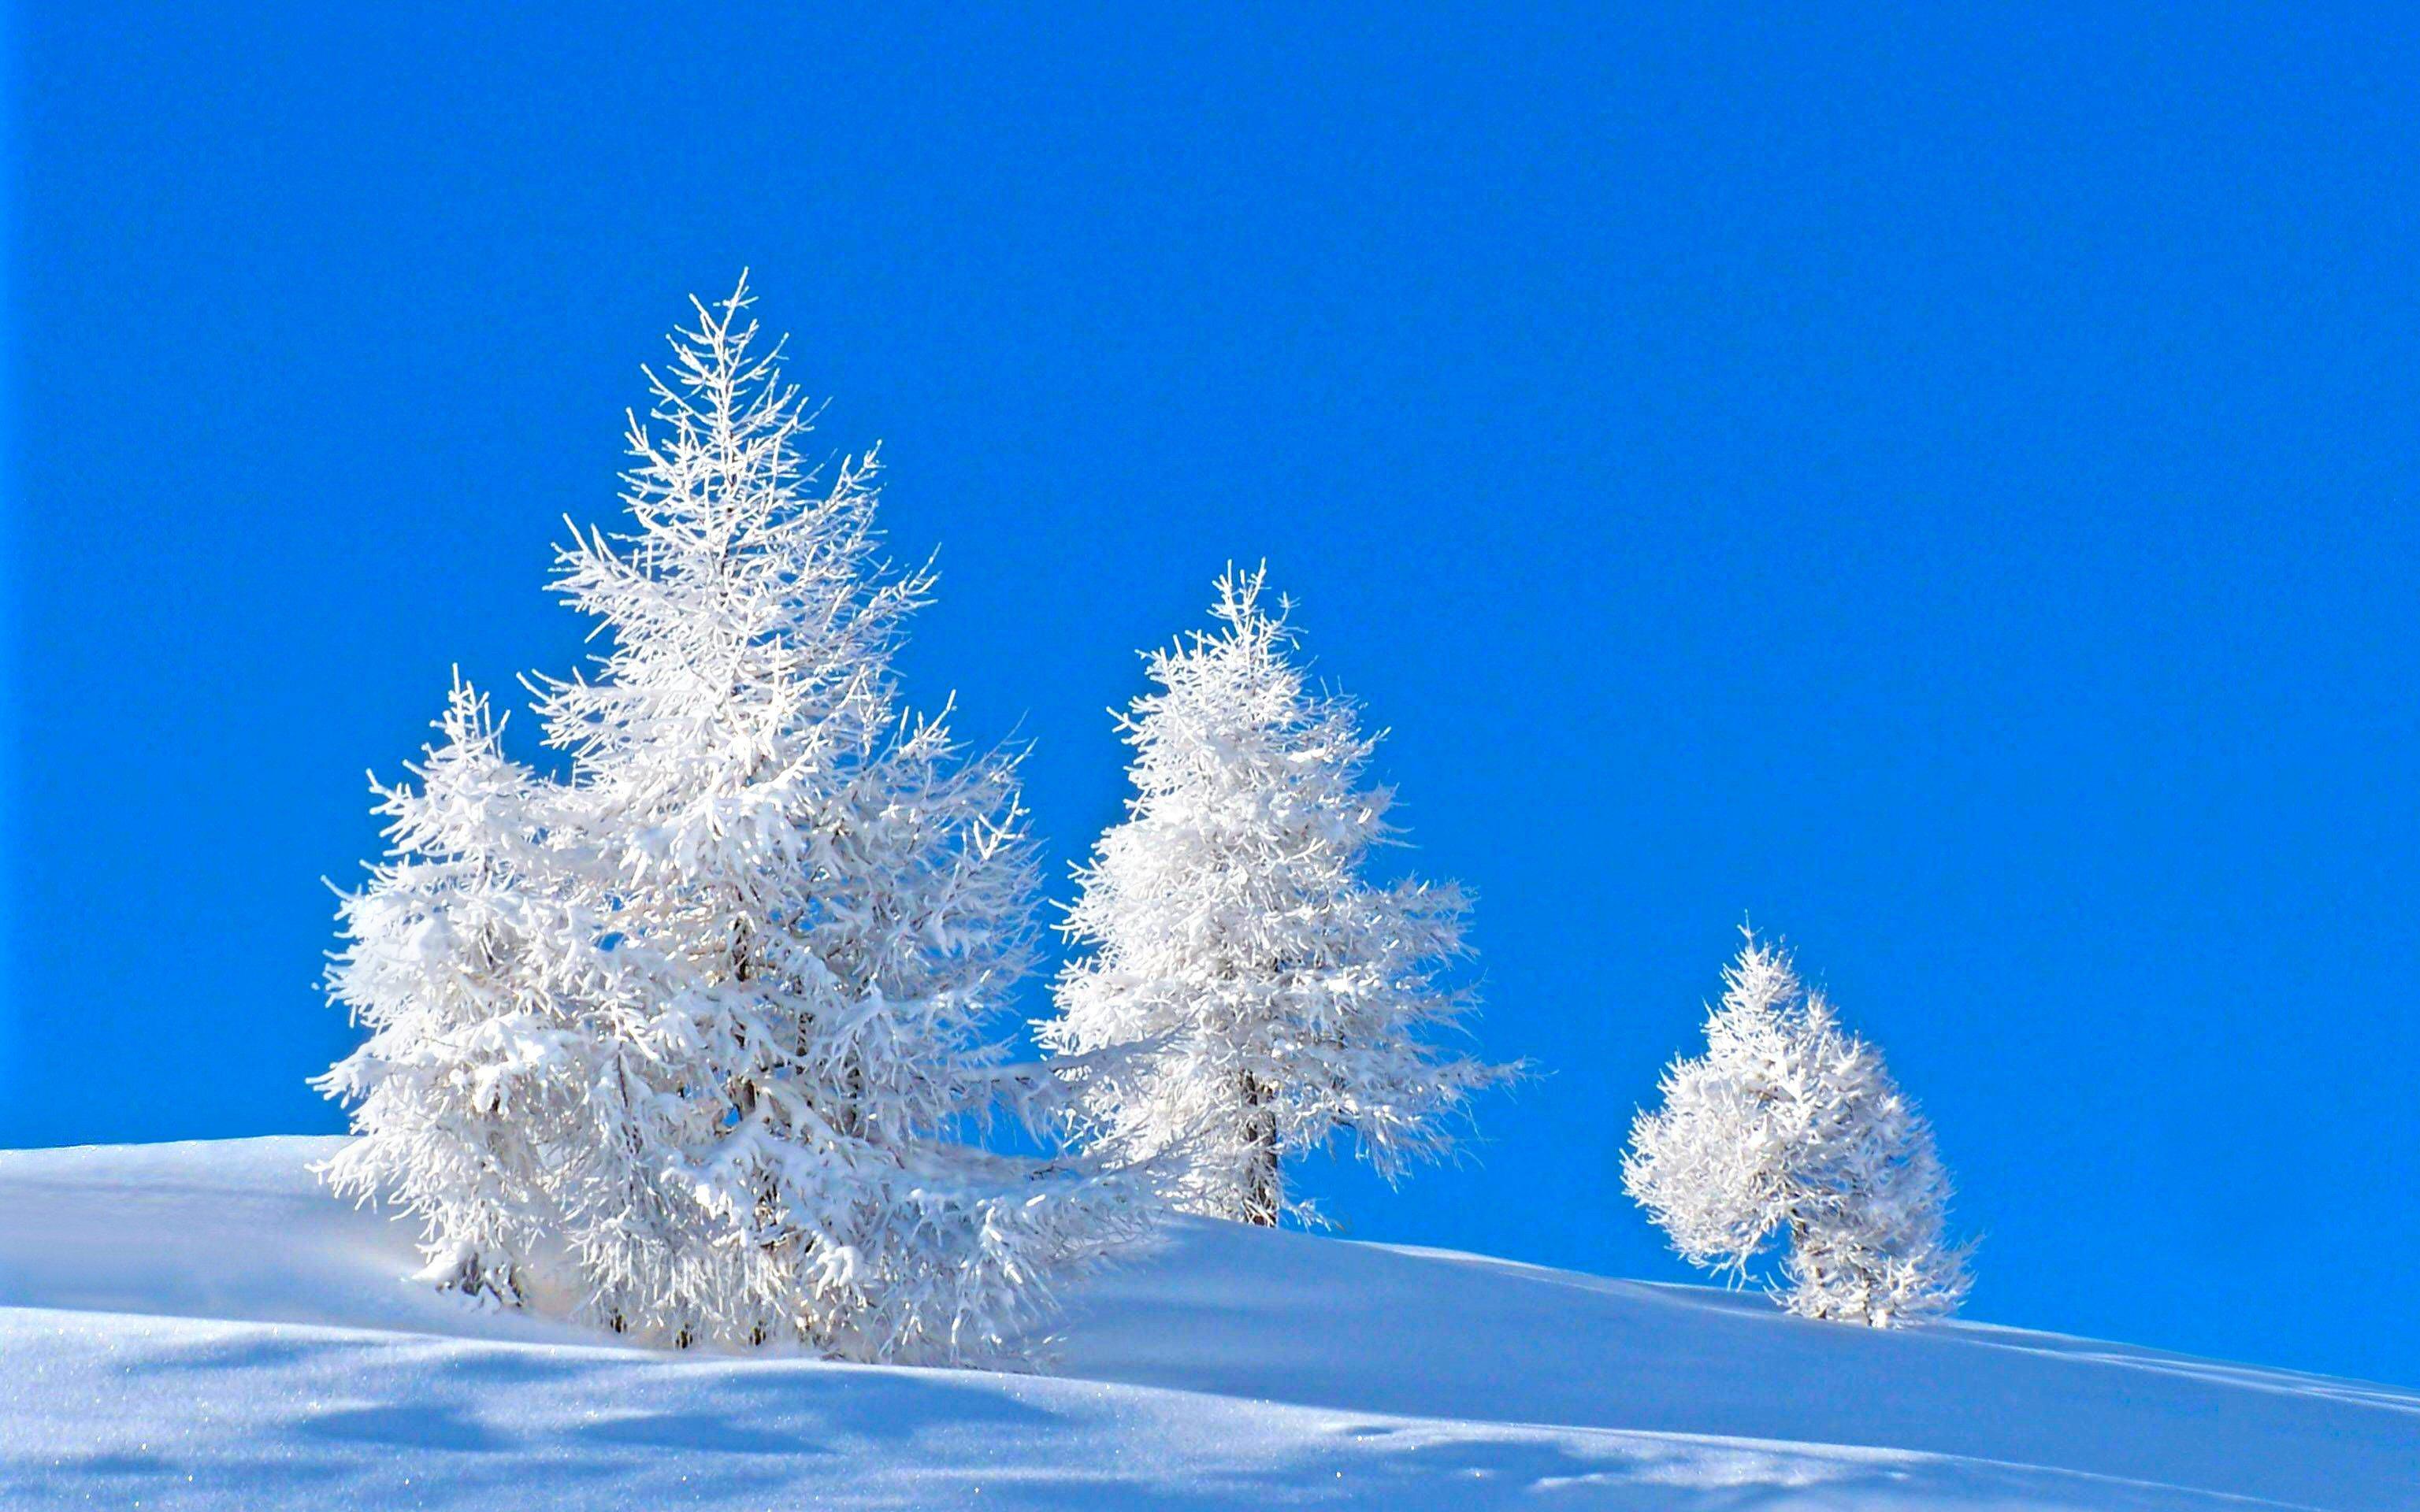 Зимние картинки на заставку компьютера